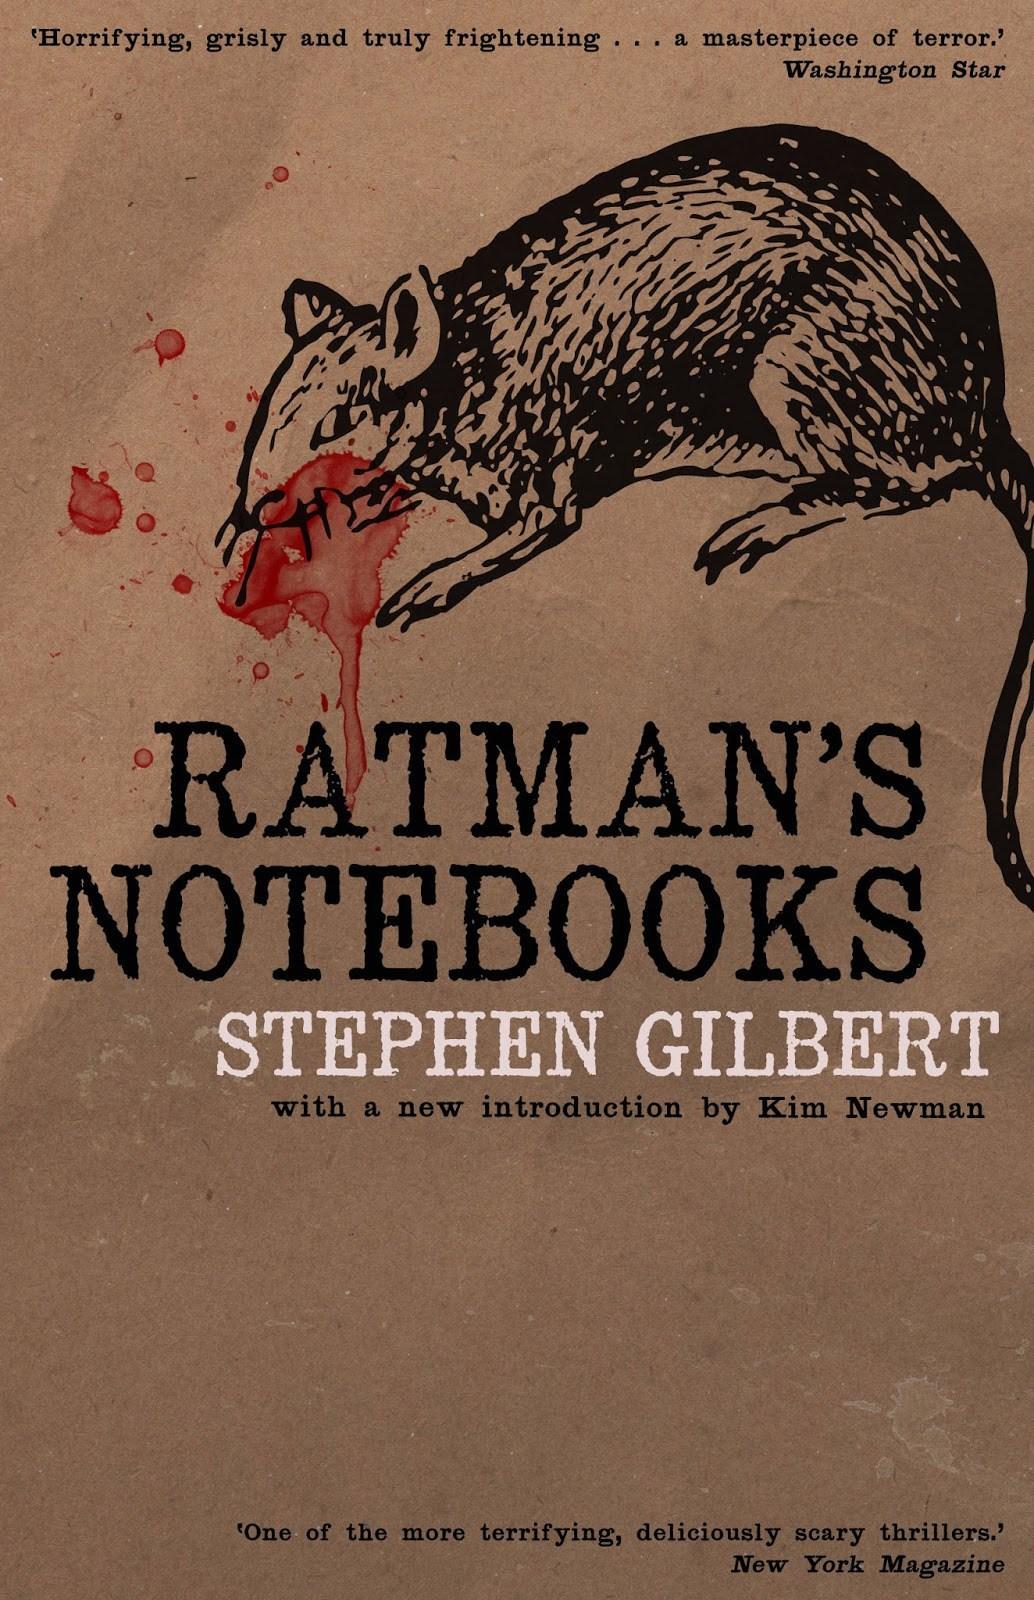 http://static.tvtropes.org/pmwiki/pub/images/ratmans_notebook_f.jpg